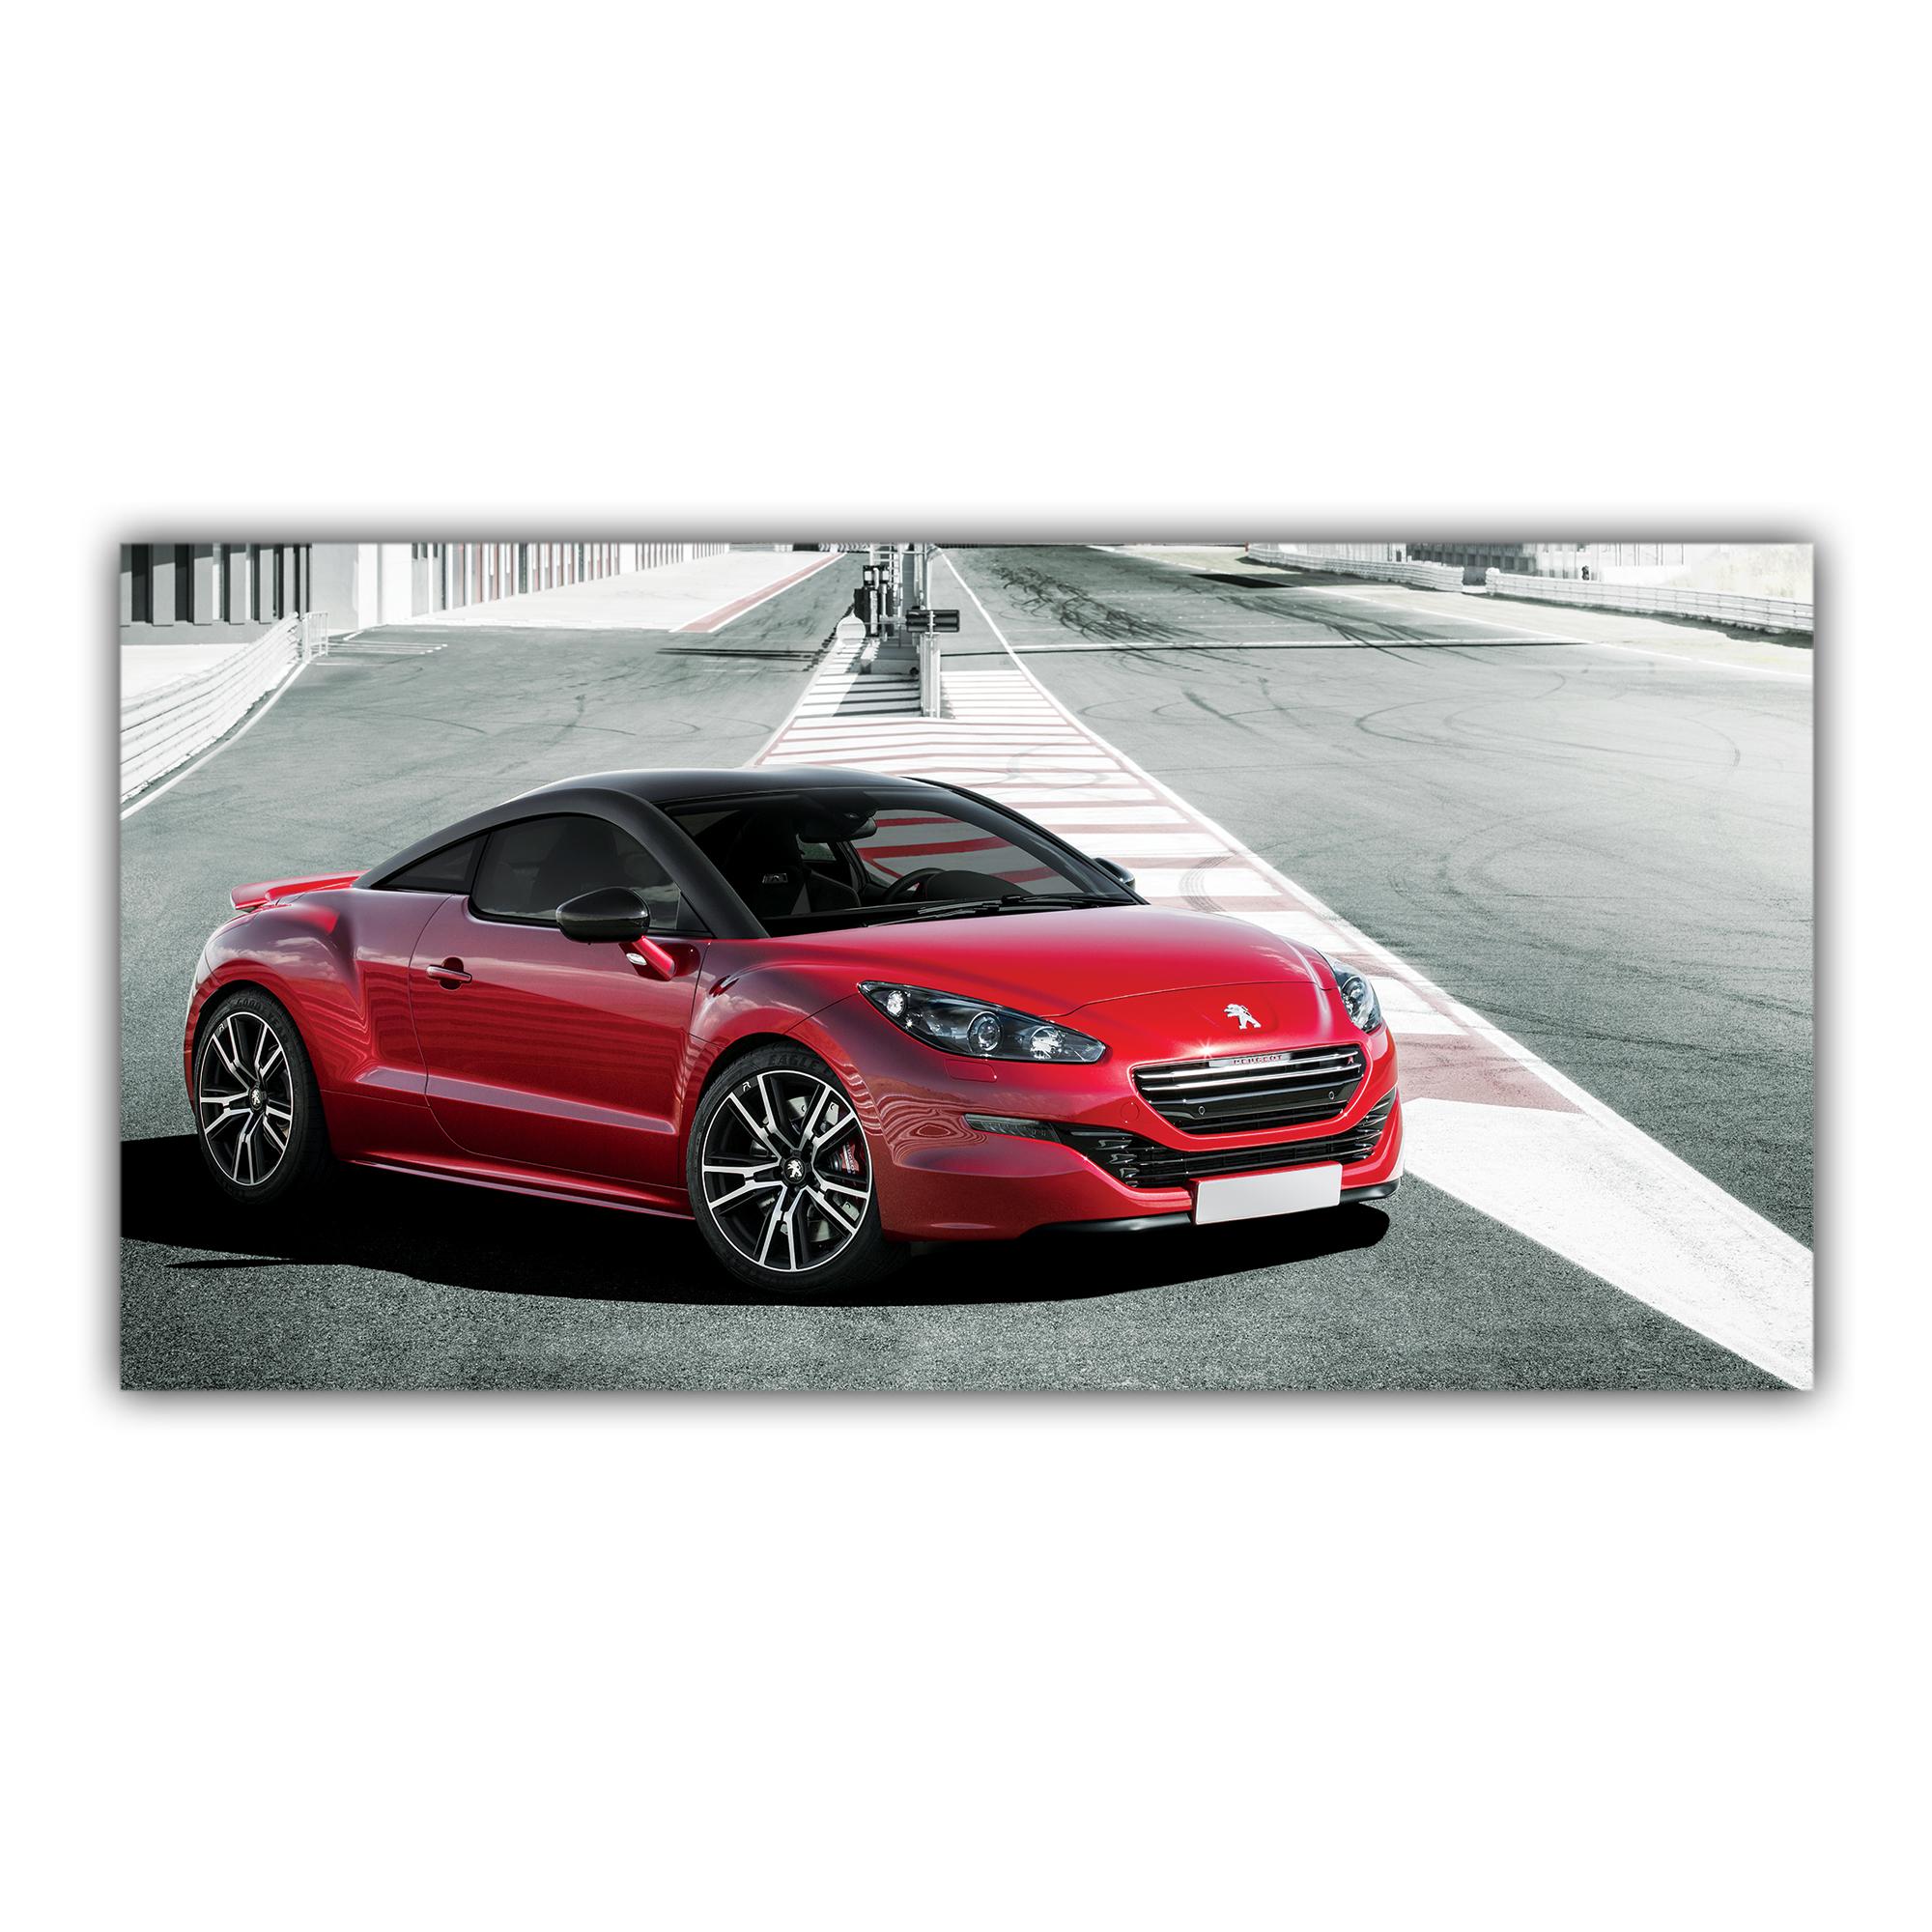 rcz peugeot sport voiture fran aise rouge circuit arimaje. Black Bedroom Furniture Sets. Home Design Ideas